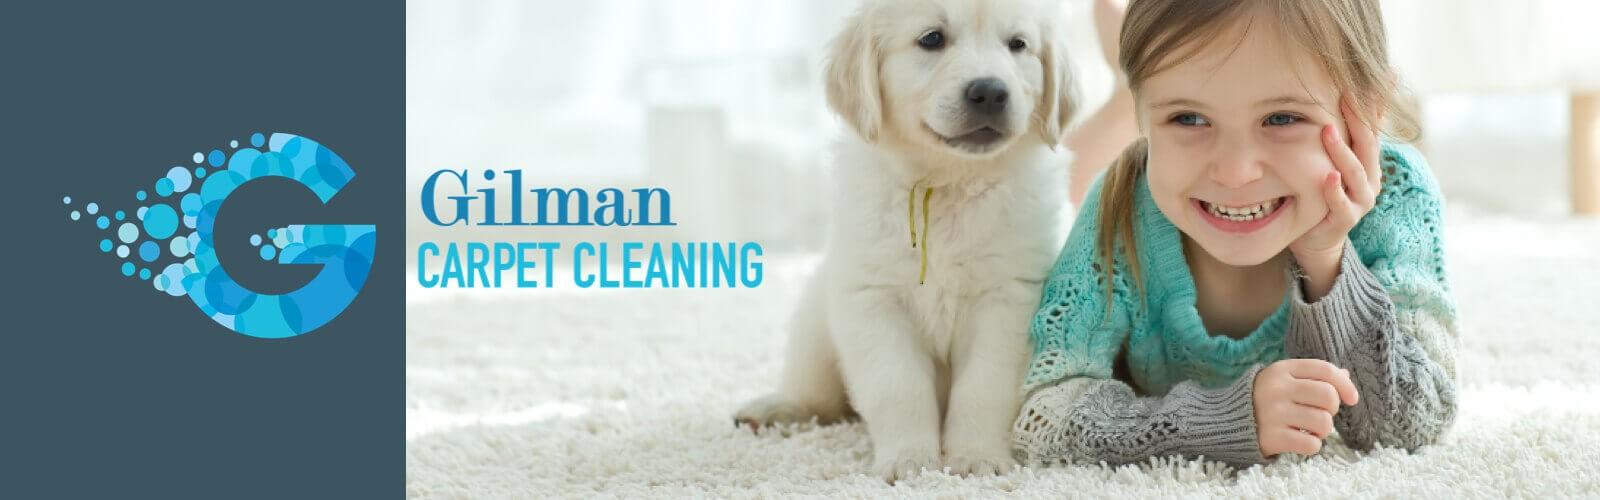 gilman-carpet-cleaning